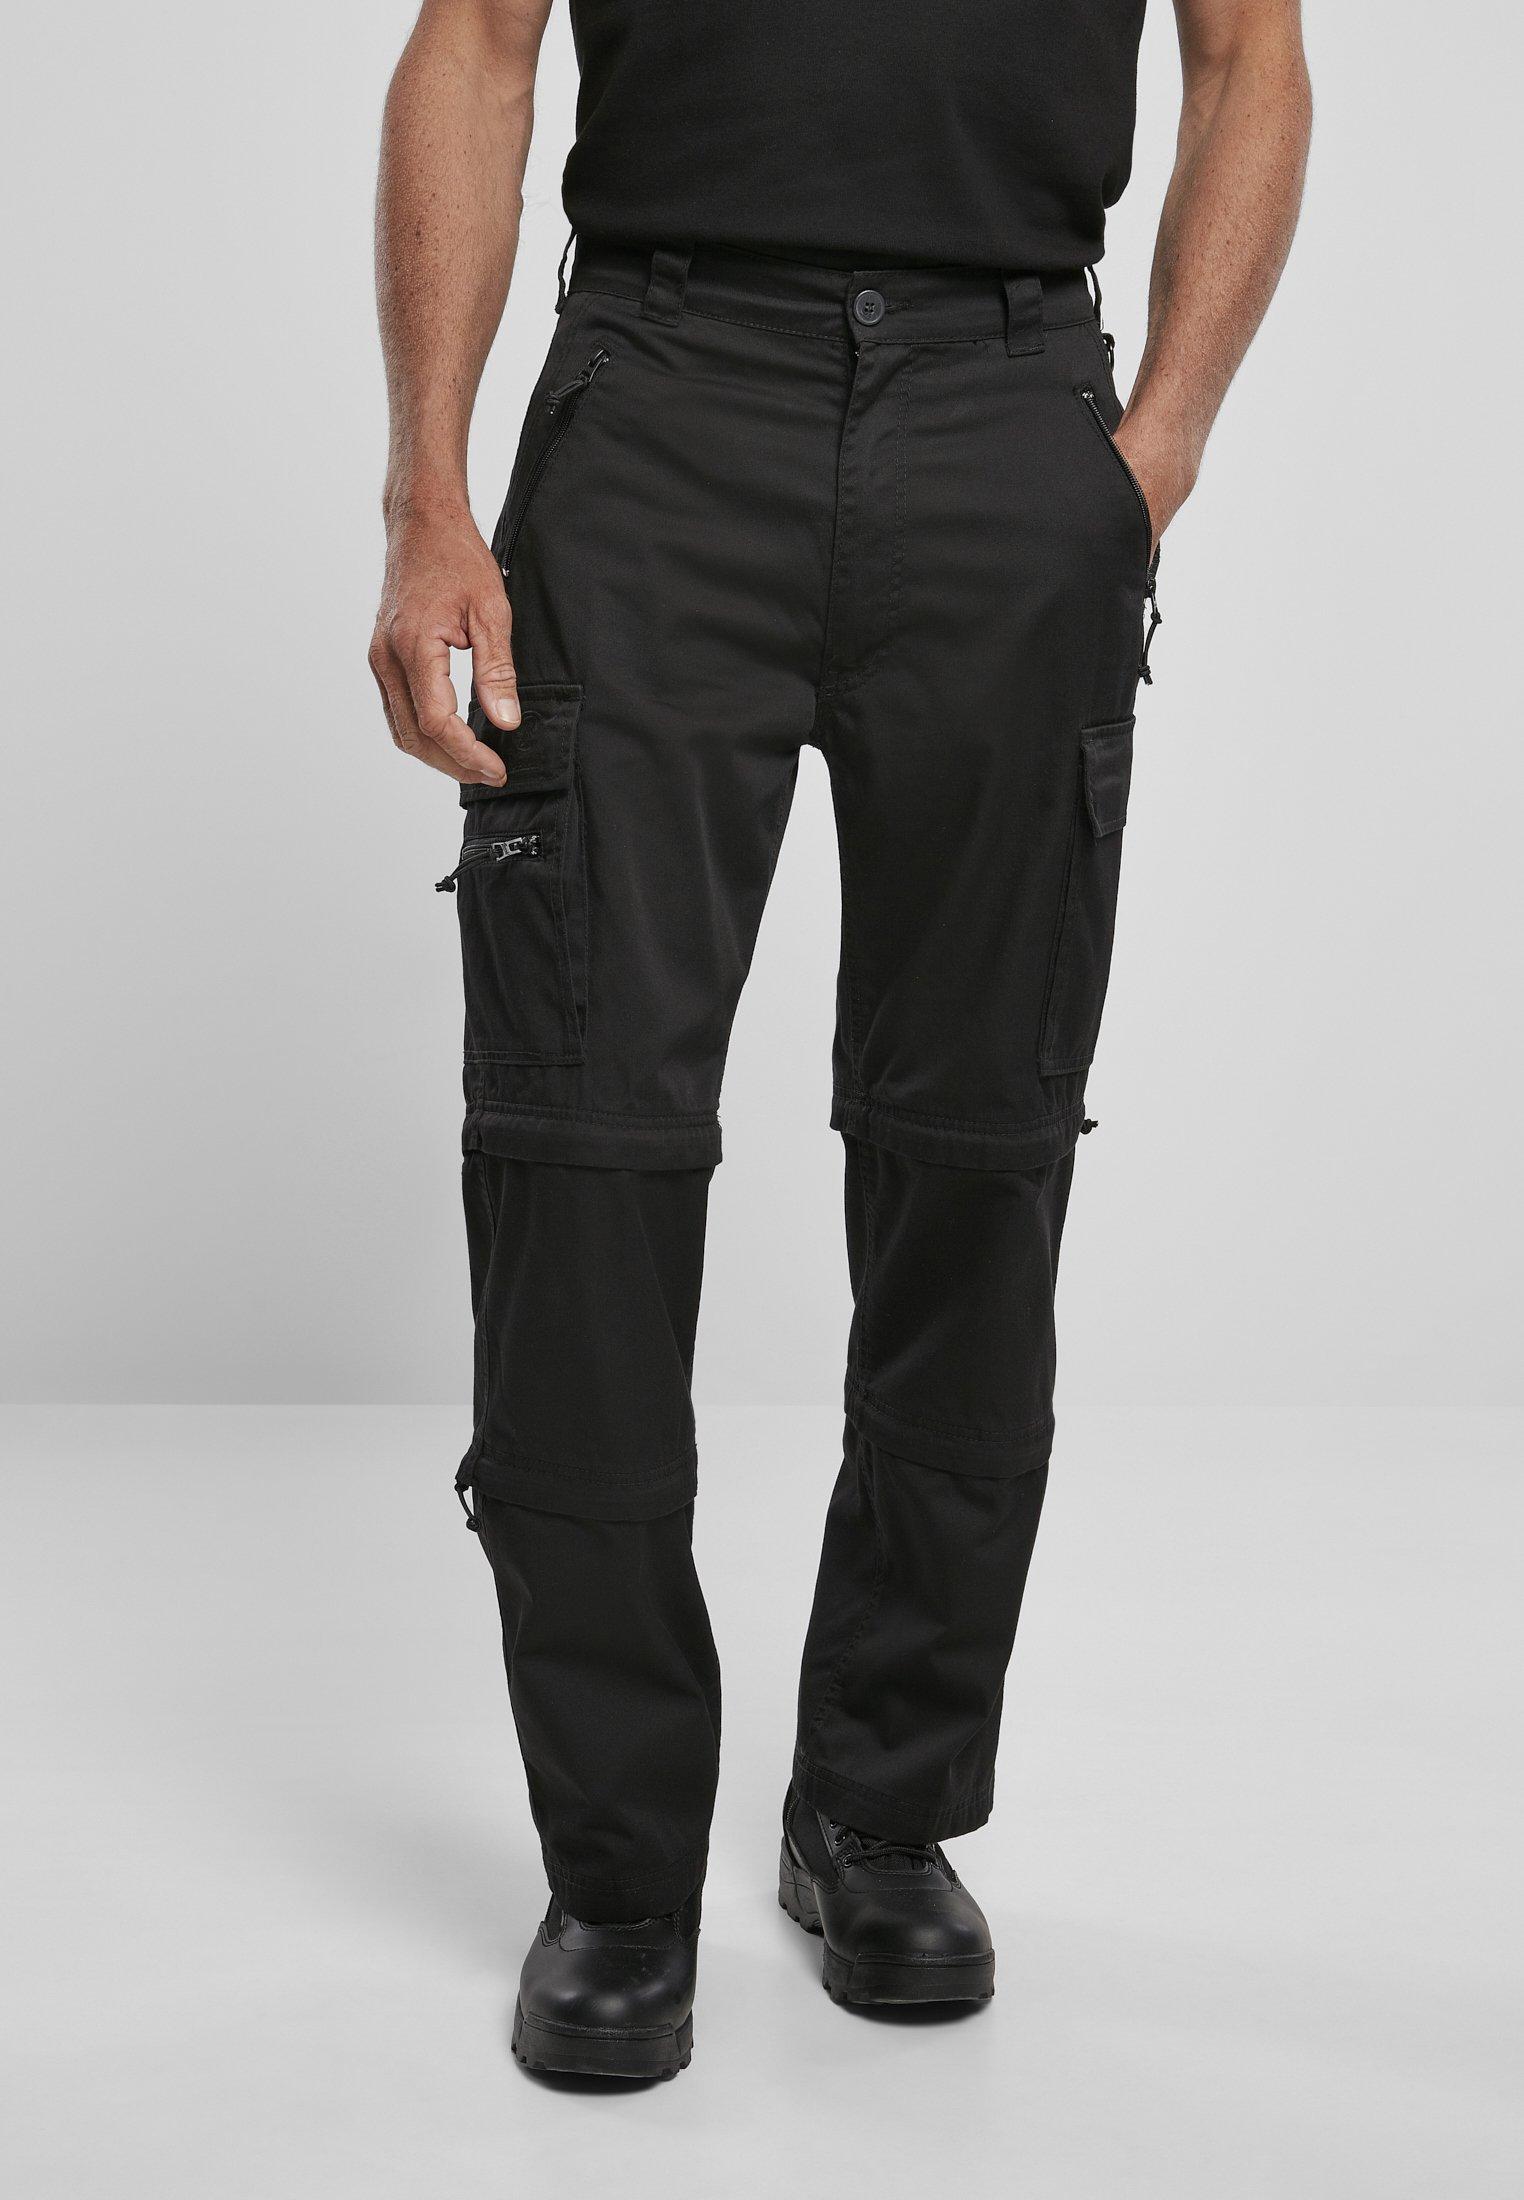 Homme SAVANNAH - Pantalon cargo